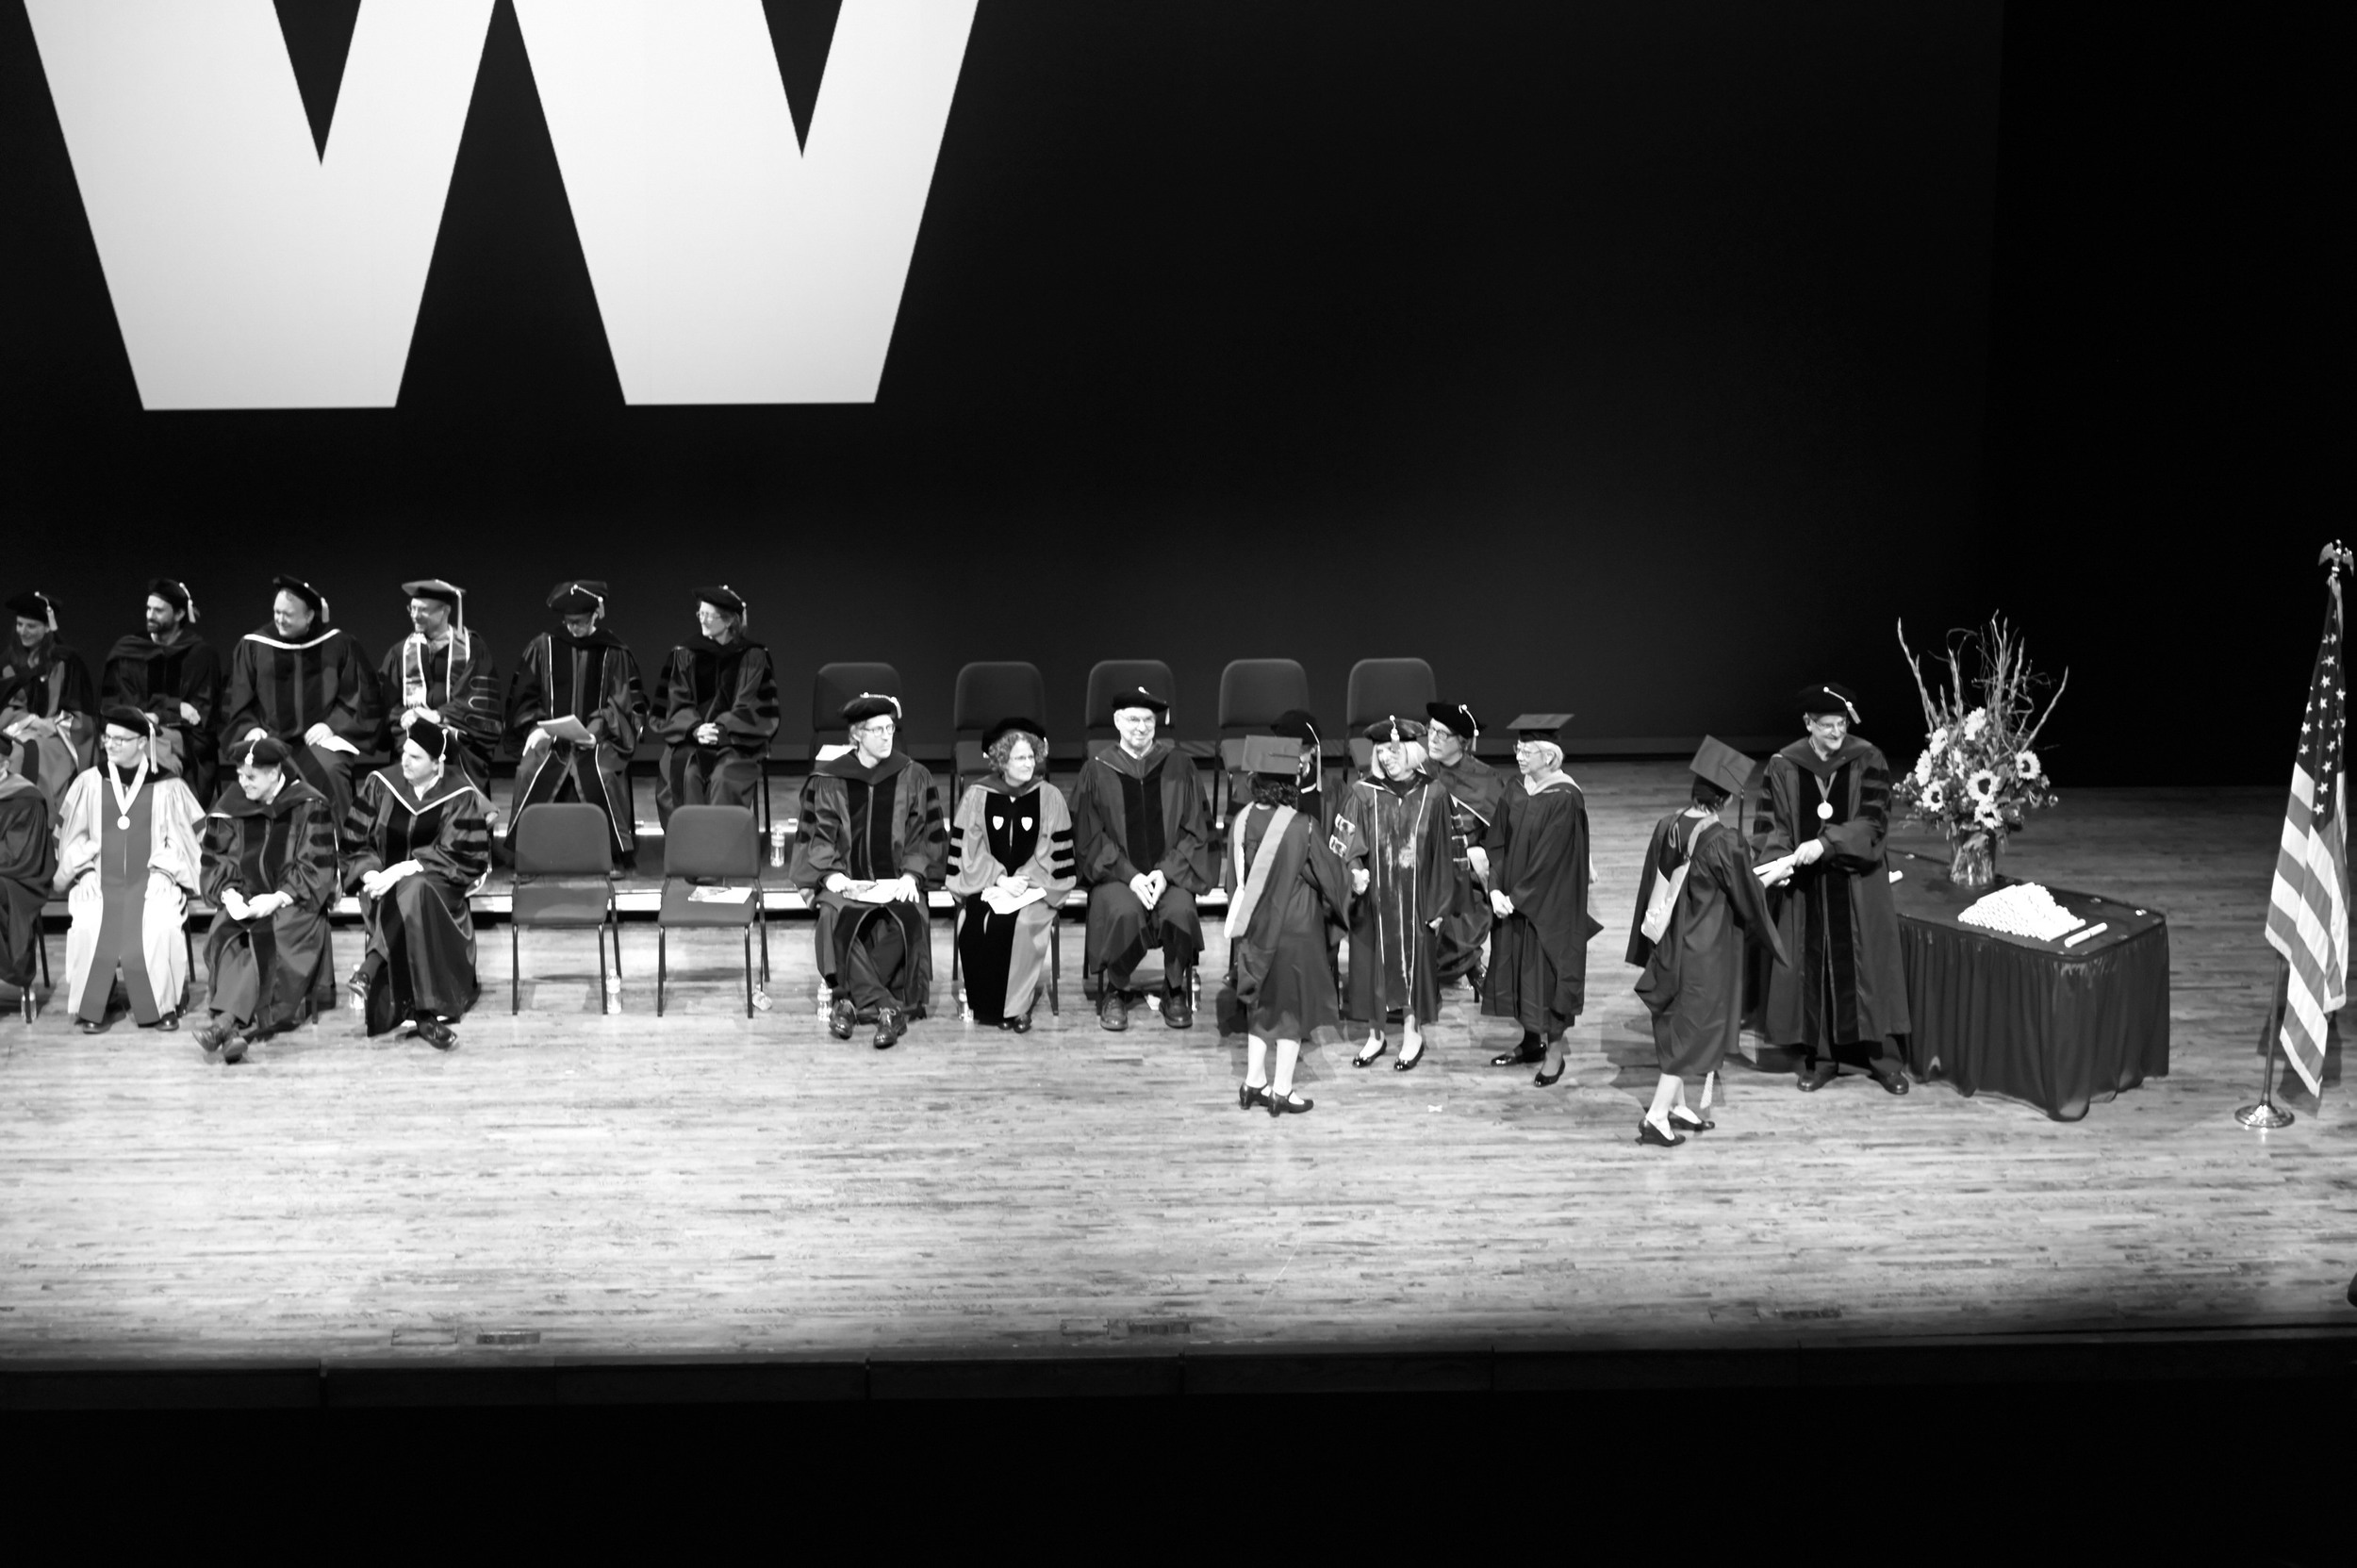 20140612_m9_EvansSchool_Graduation_013_BW.jpg